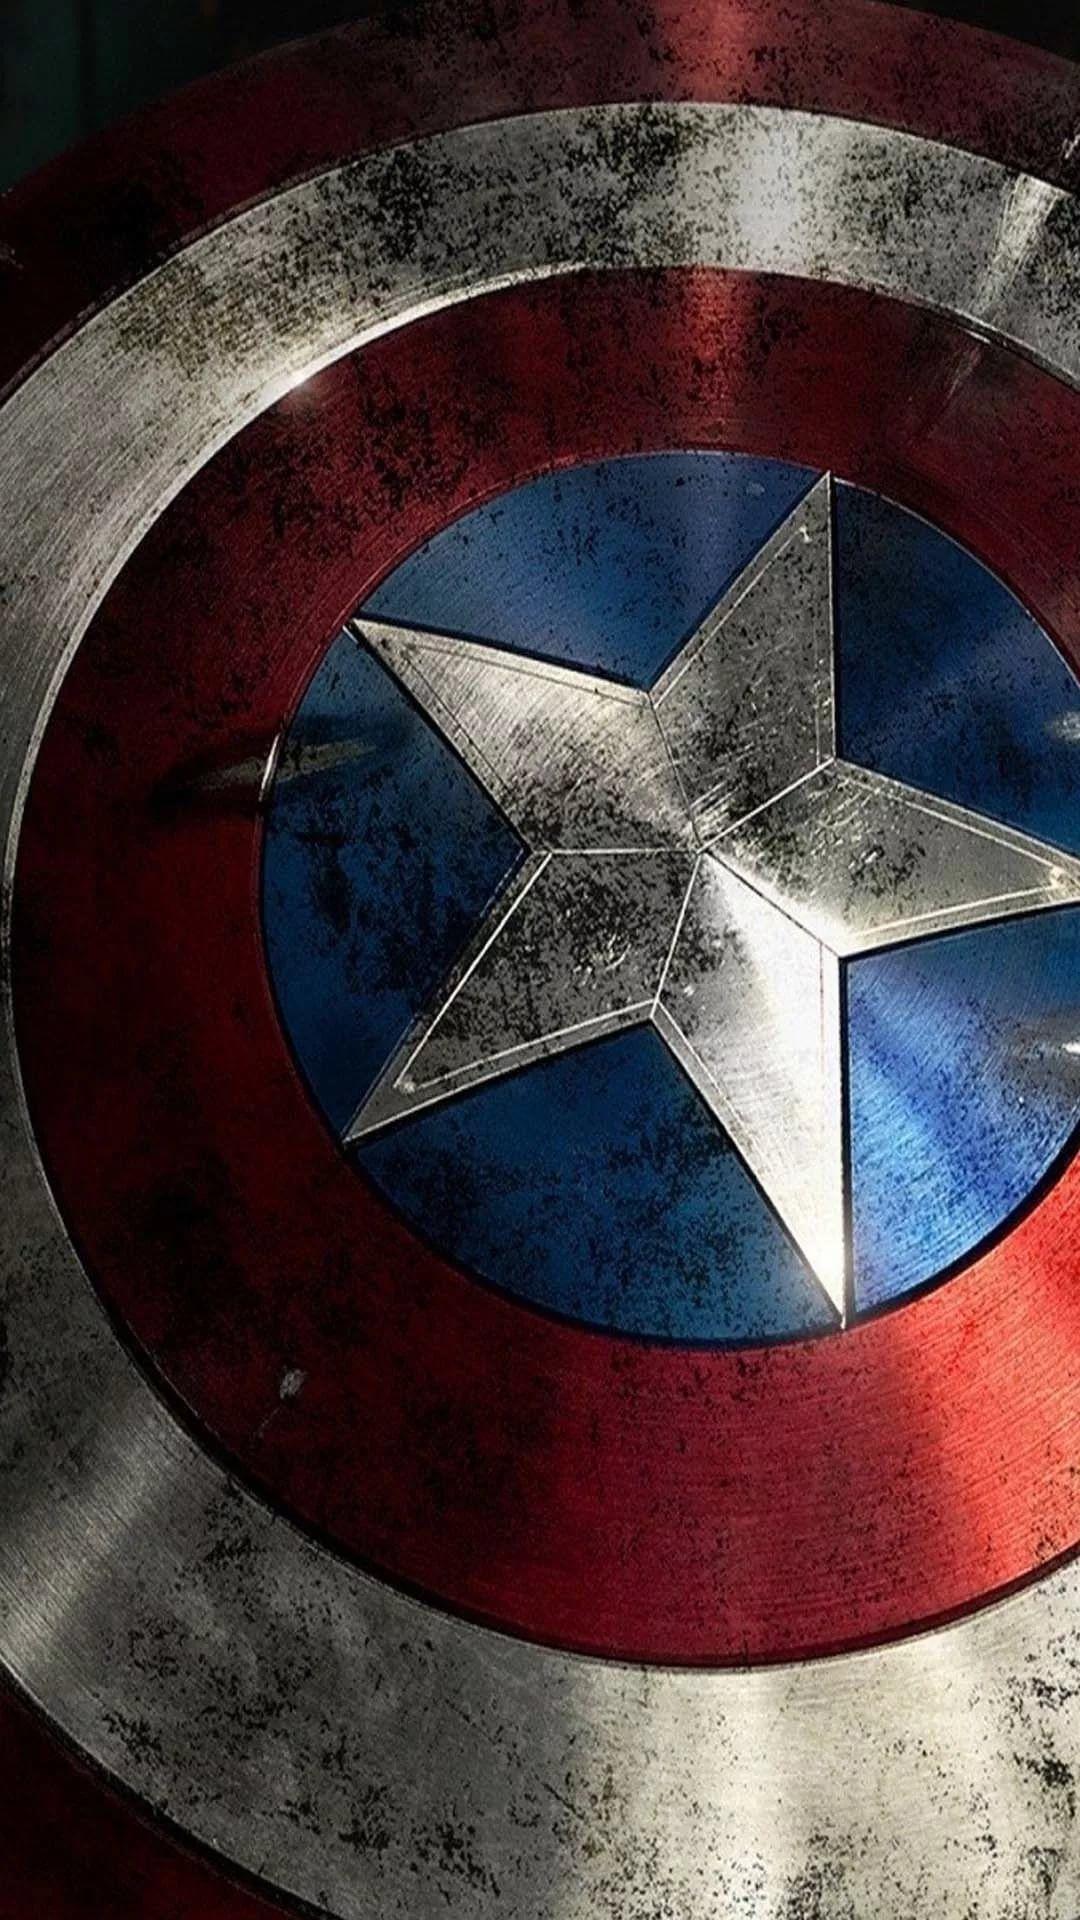 Marvel iPhone hd wallpaper